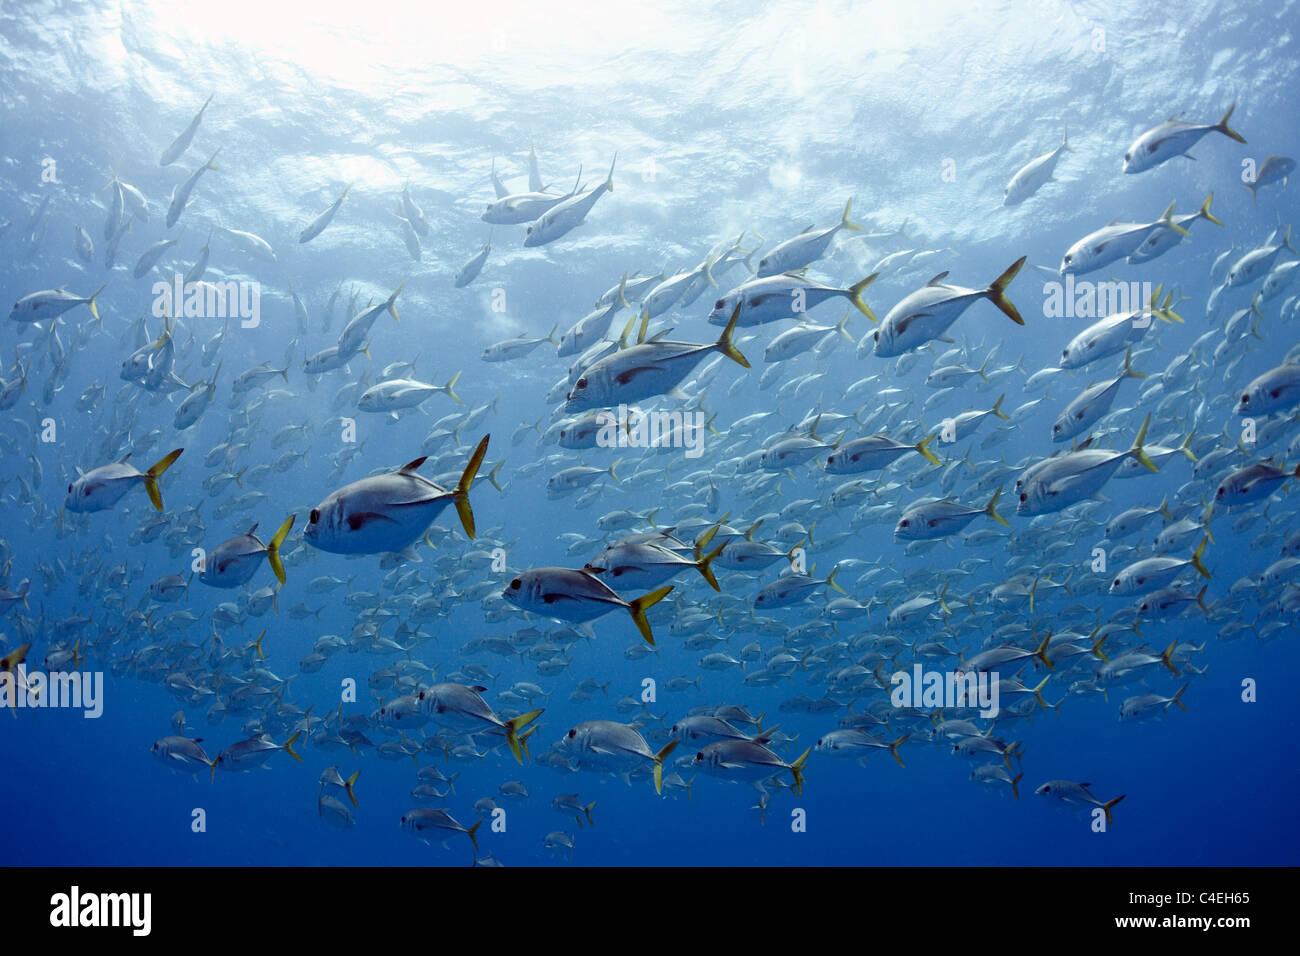 A large school of horse eye jacks (Caranx latus) swims near the surface of the ocean at Jardines de la Reina off - Stock Image